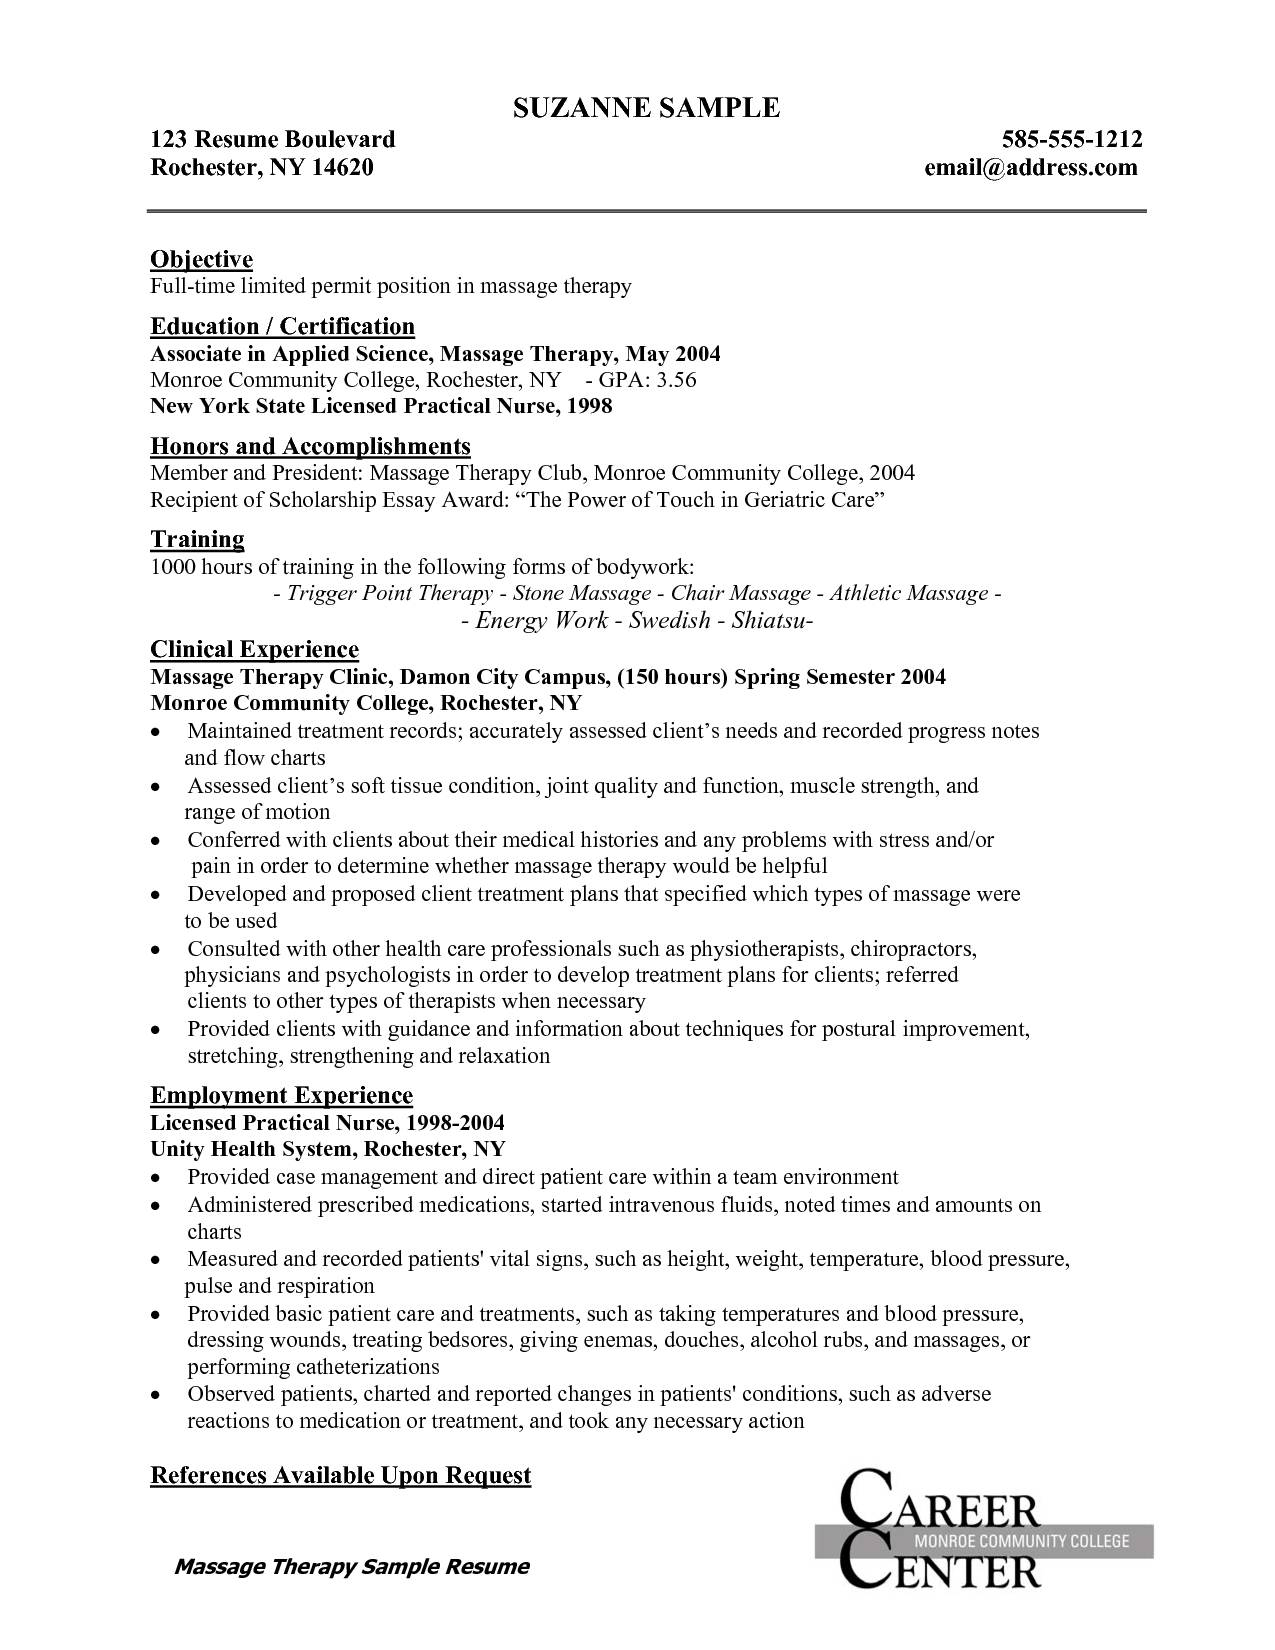 New Grad Lvn Resume Template